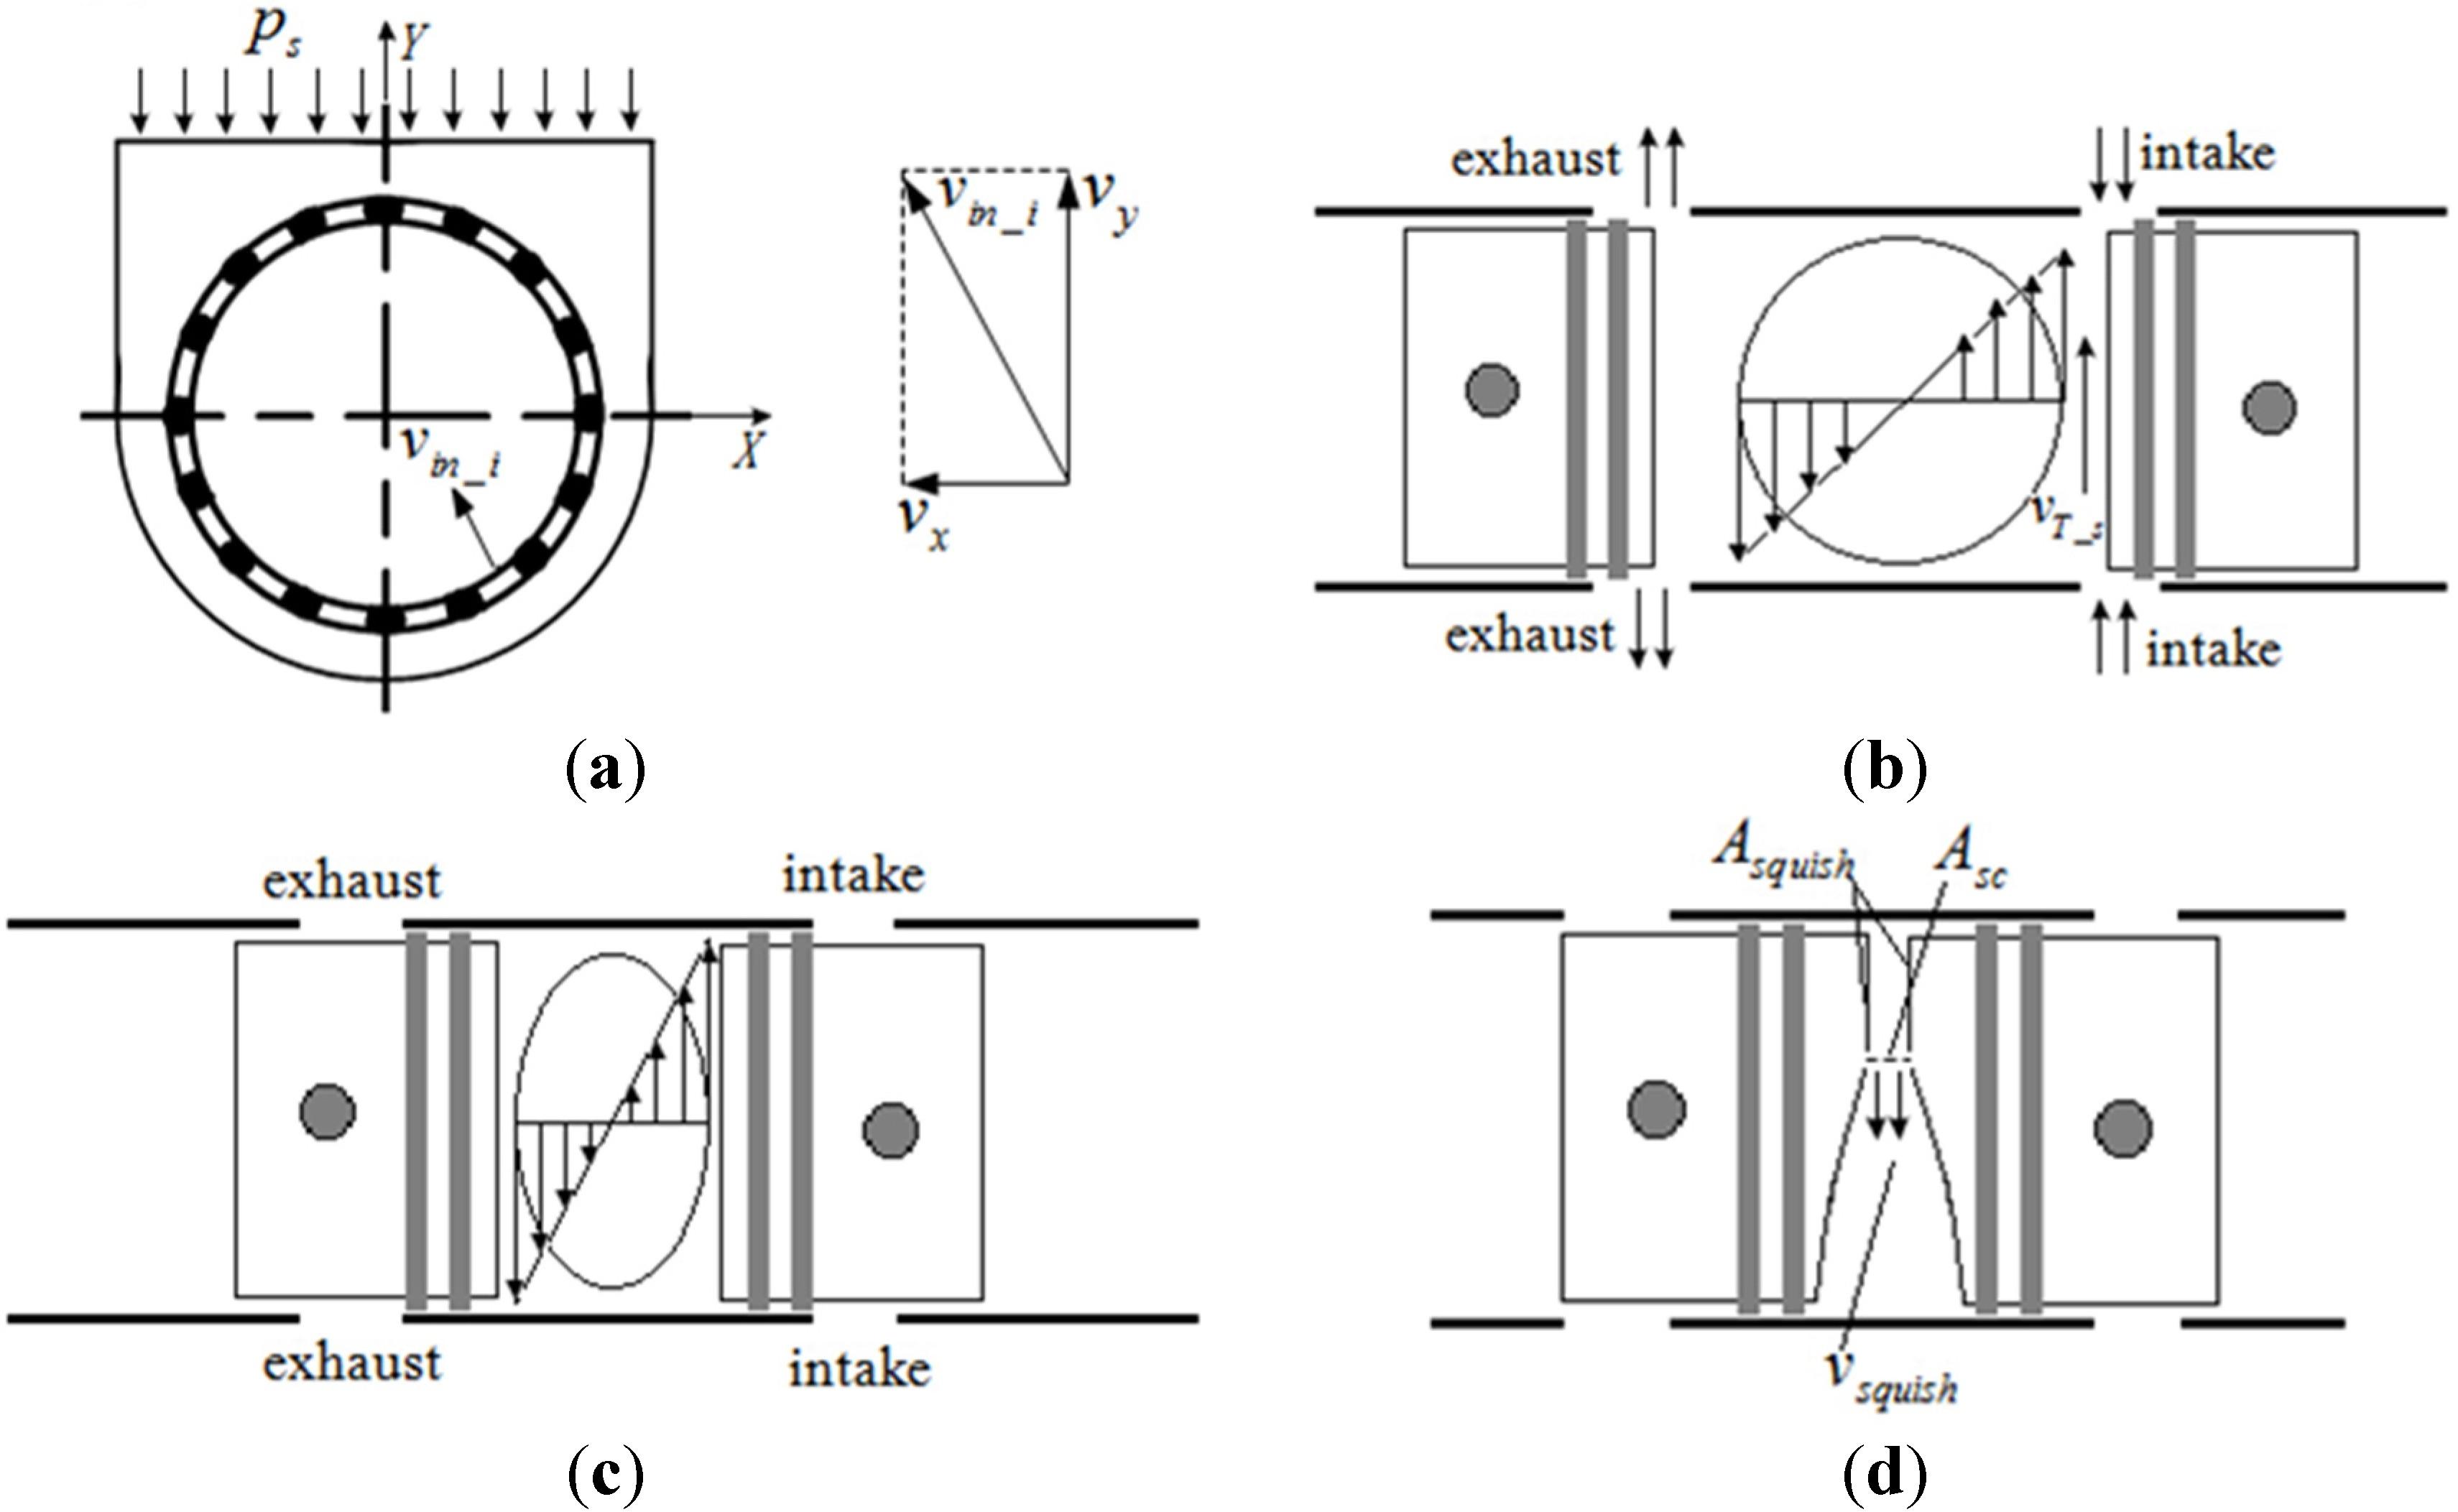 Marine Engine Diagram Energies Free Full Text Of Marine Engine Diagram